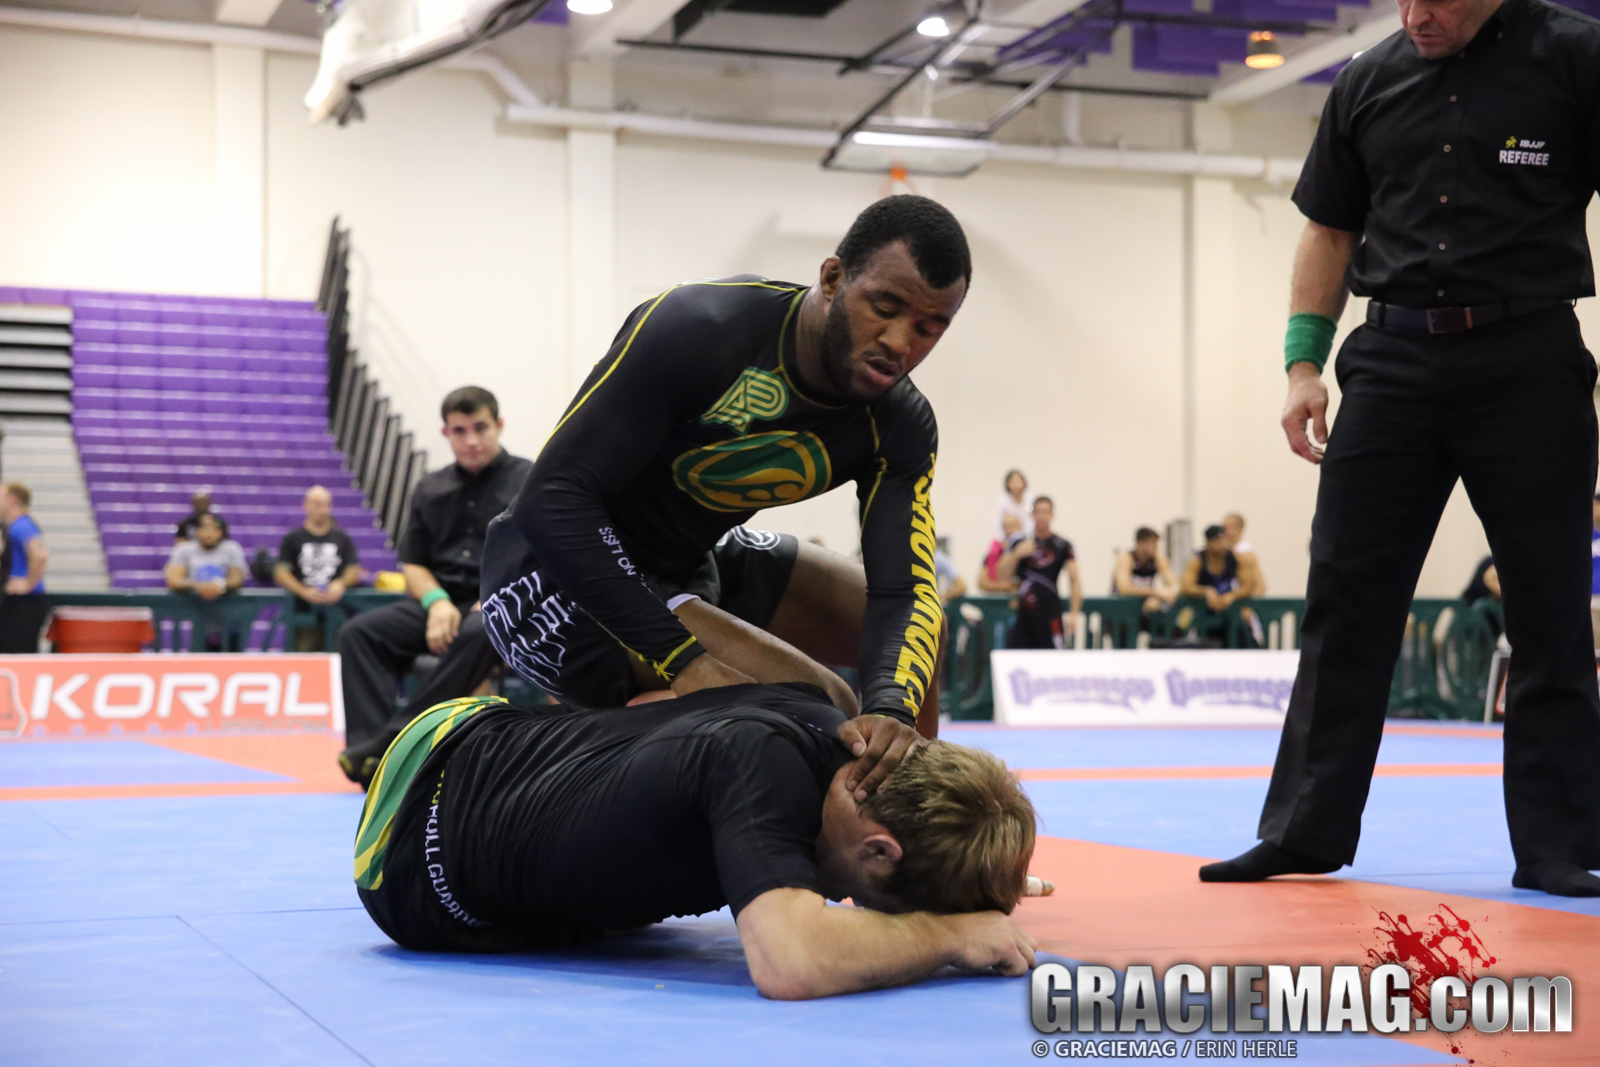 Jackson Sousa against AJ Agazarm in the open class final. Photo: Erin Herle